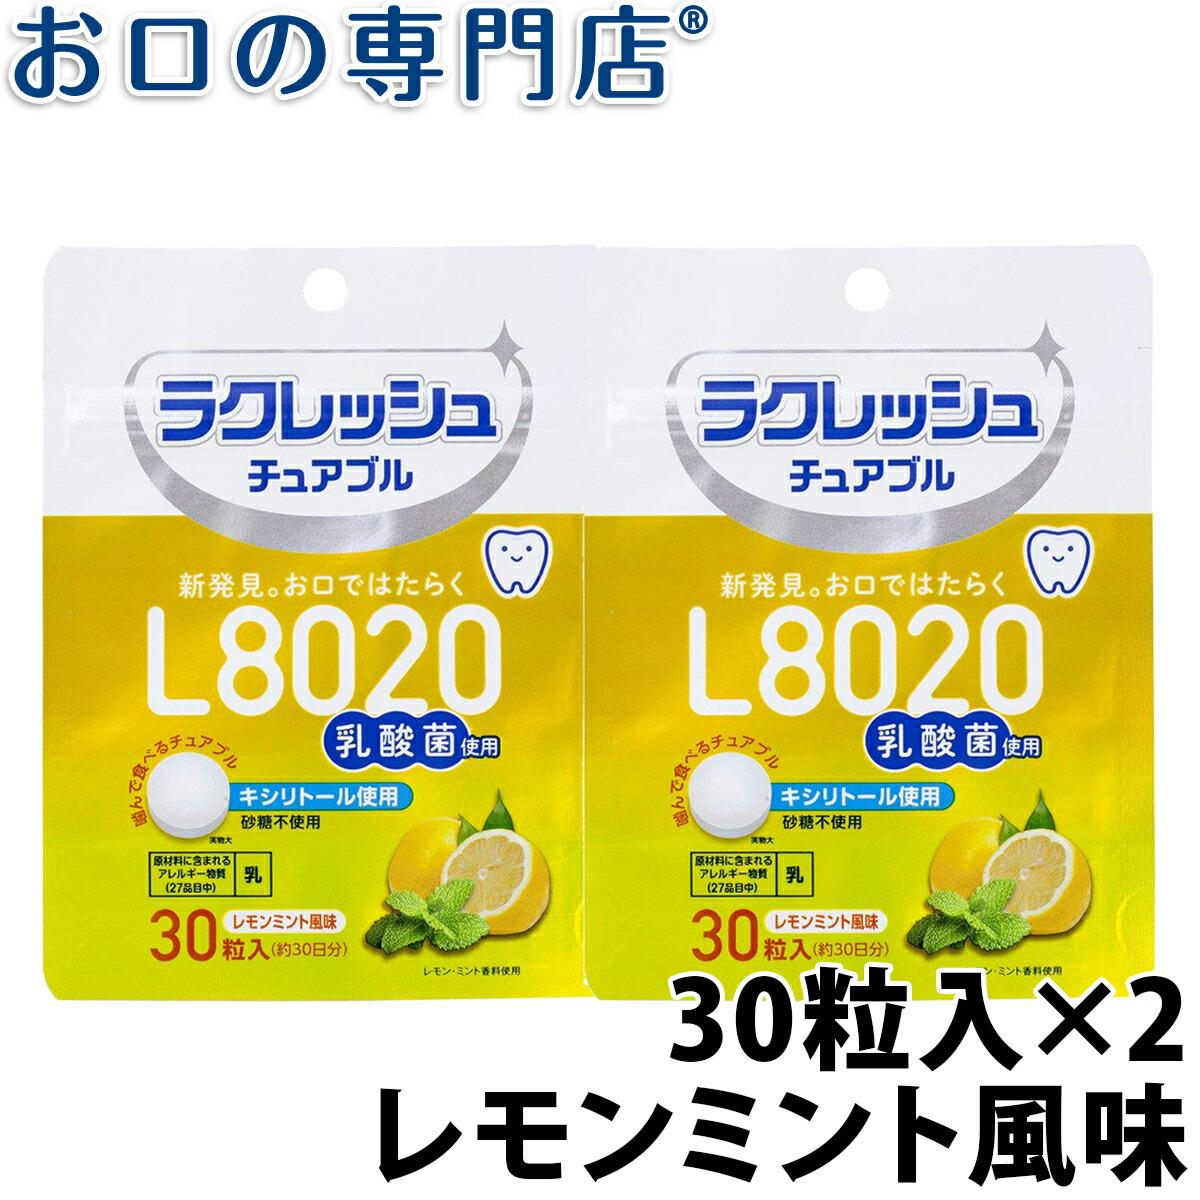 L8020乳酸菌使用 高額売筋 噛んで食べるチュアブル キシリトール使用 砂糖不使用 200円OFFクーポンあり 送料無料 タブレット チュアブル L8020乳酸菌ラクレッシュ 割引 30粒 レモンミント風味 2袋